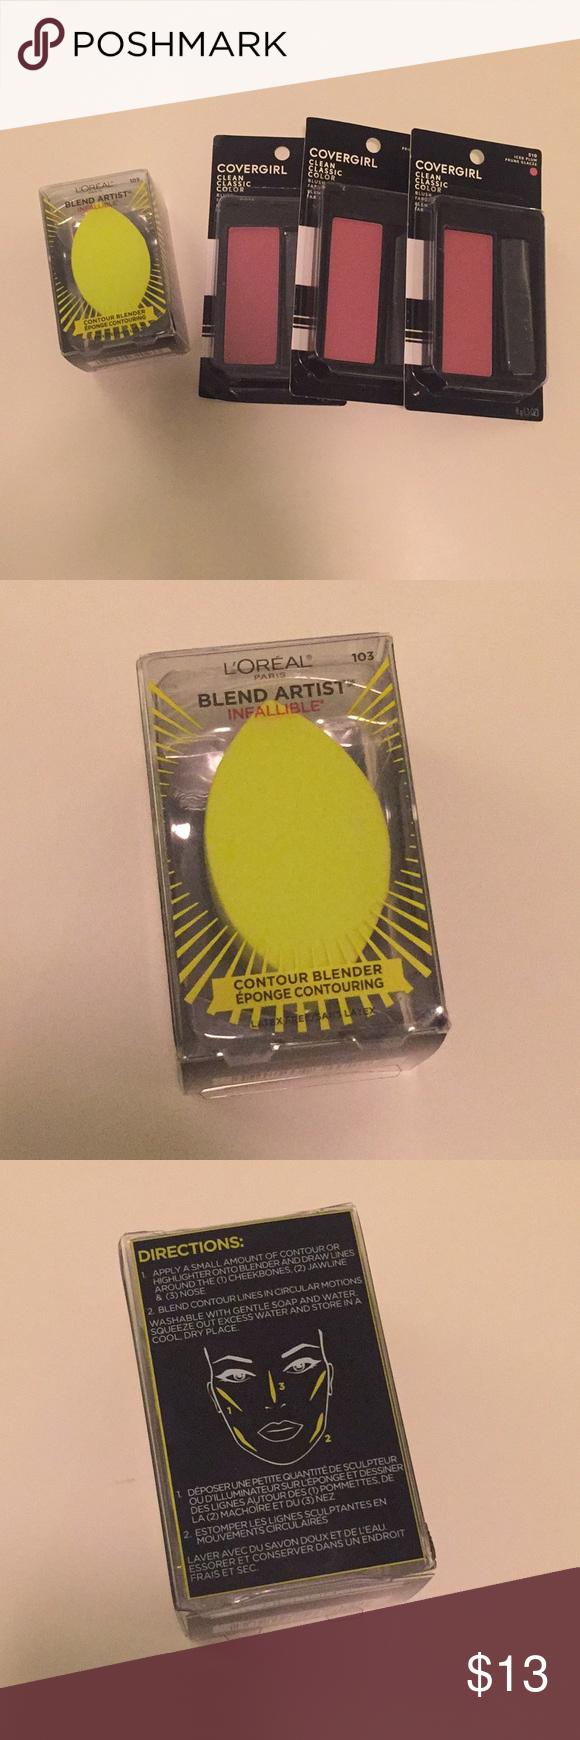 L'Oreal Blender Covergirl Classic Iced Plum Blush Bundle